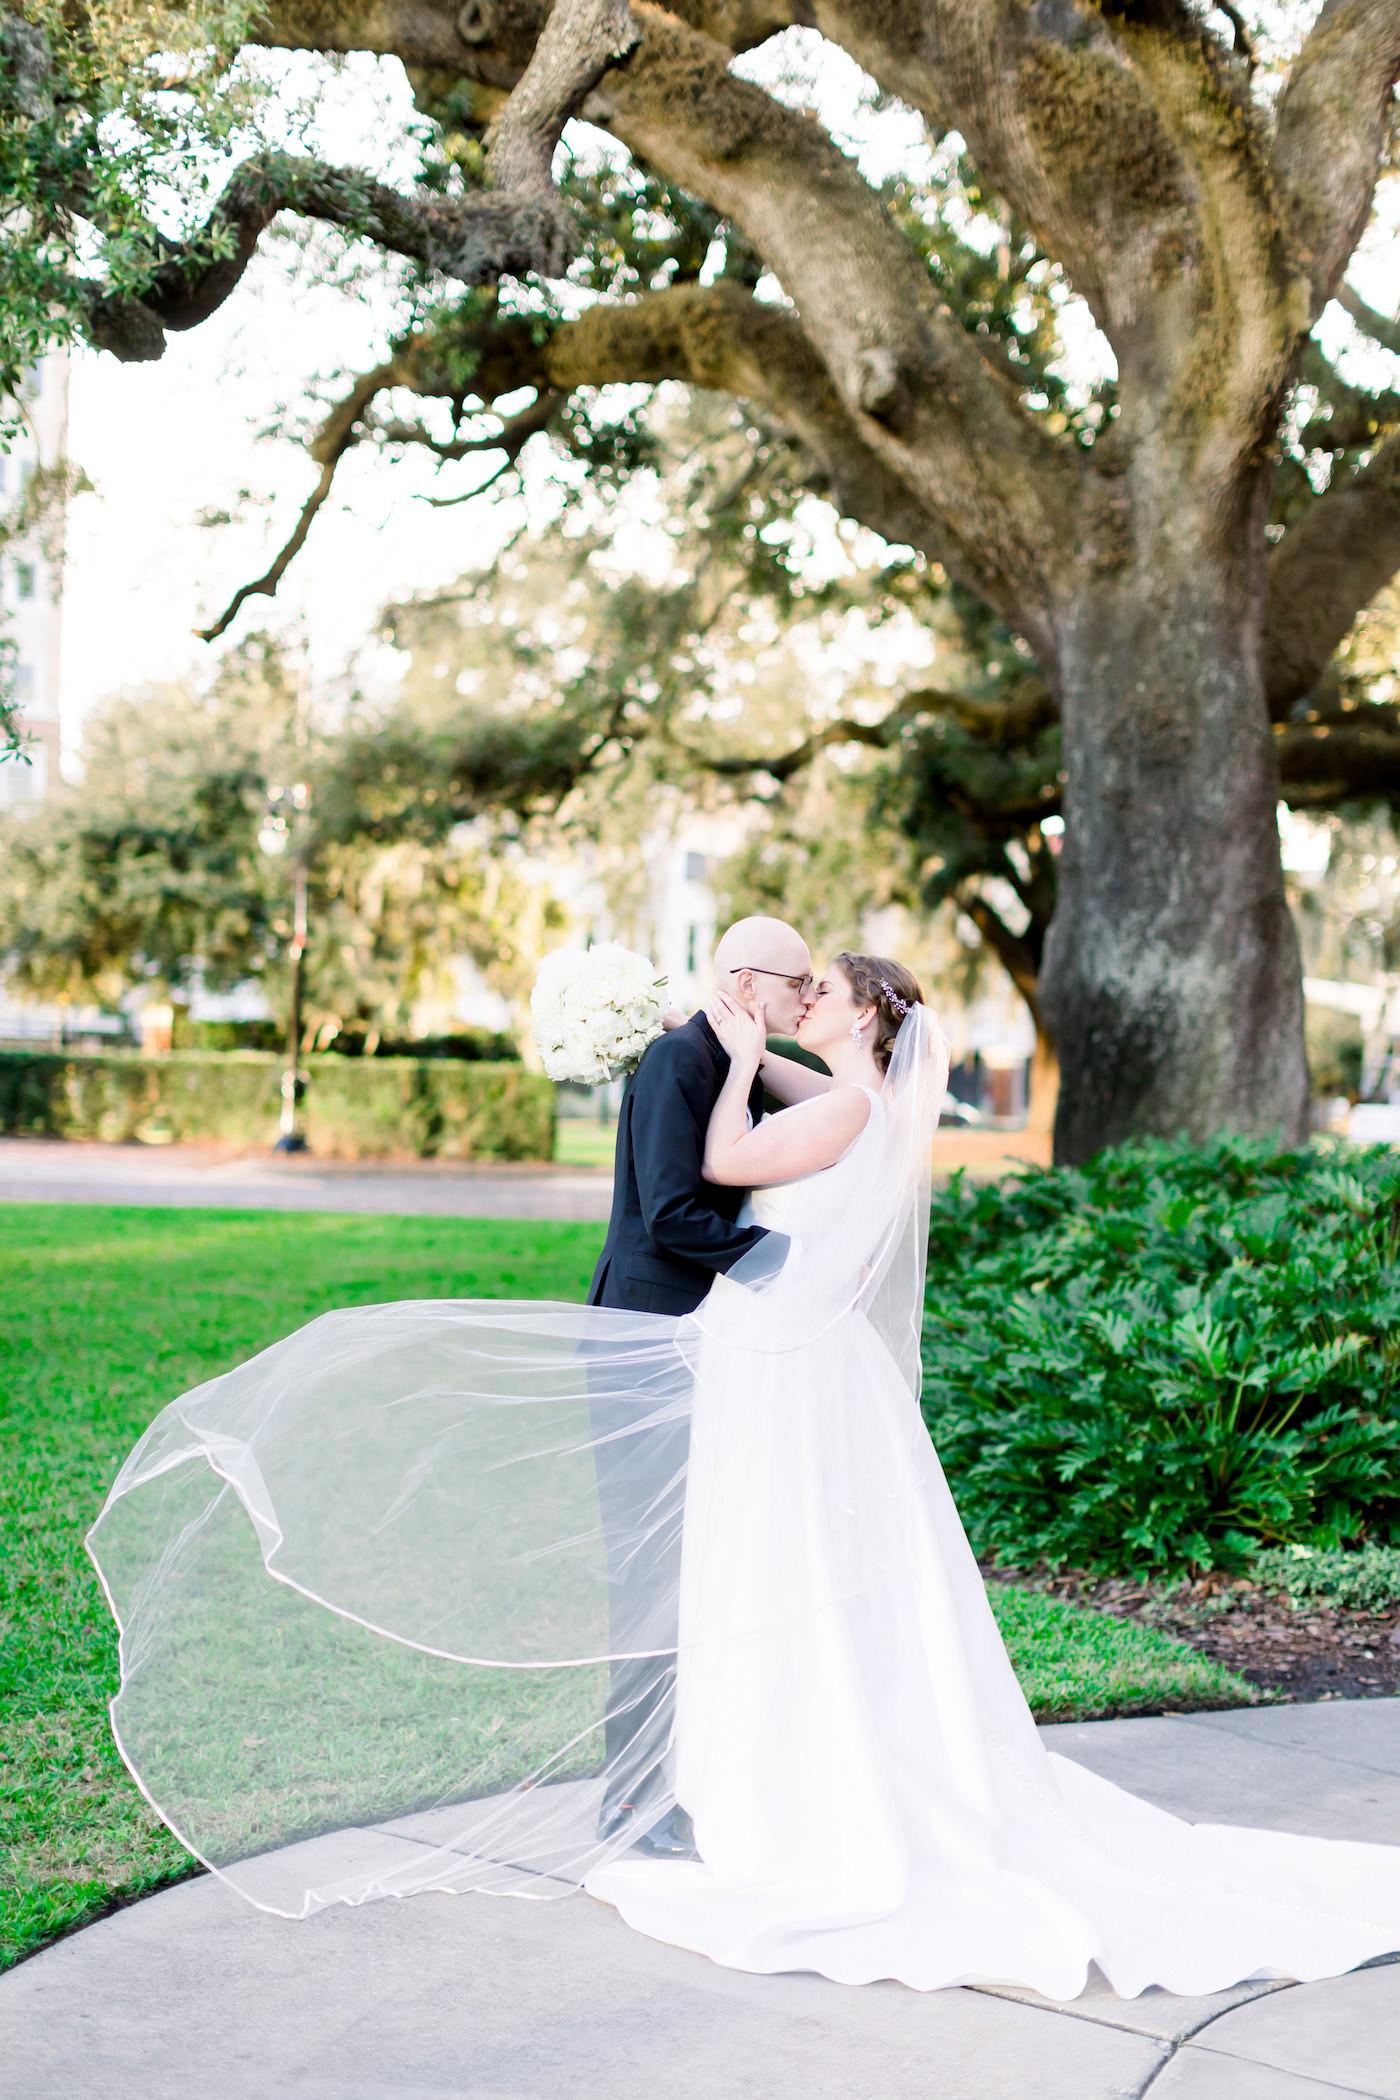 Romantic Classic Bride and Groom Veil Blowing Portrait | Wedding Photographer Shauna and Jordon Photography | Tampa Wedding Planner UNIQUE Weddings + Events